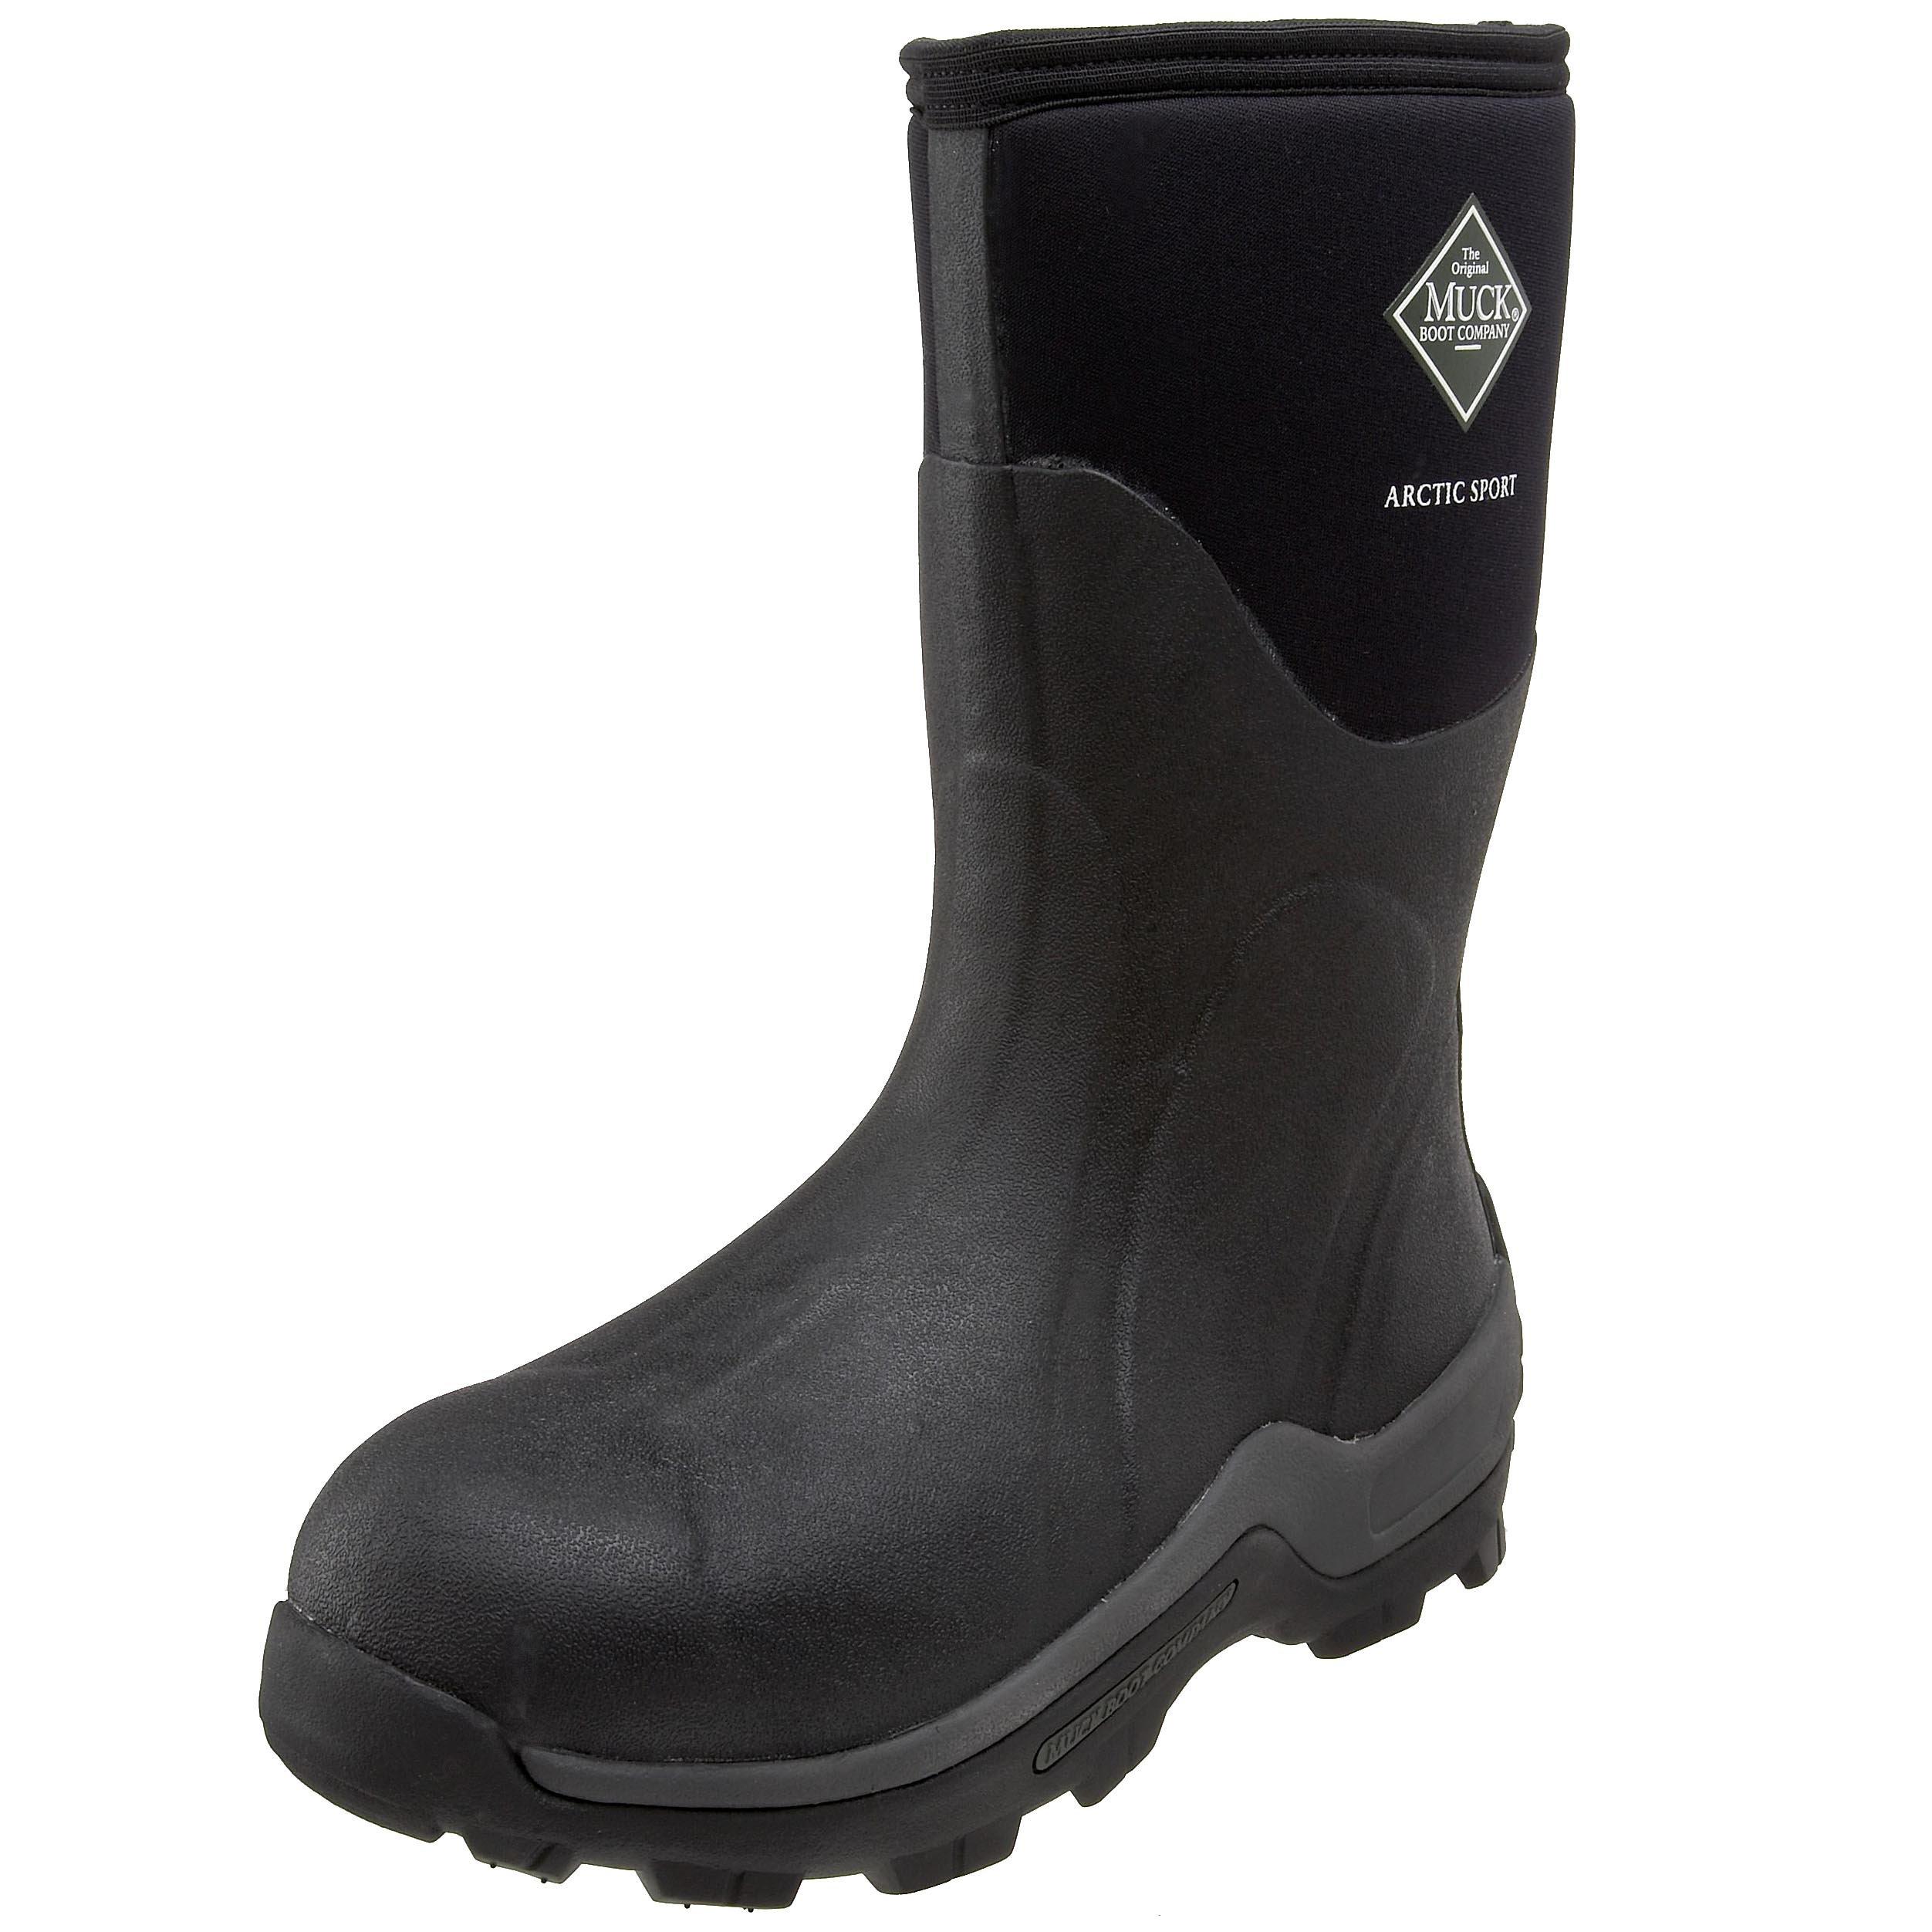 Muck Arctic Sport Rubber High Performance Men's Winter Boots by Muck Boot